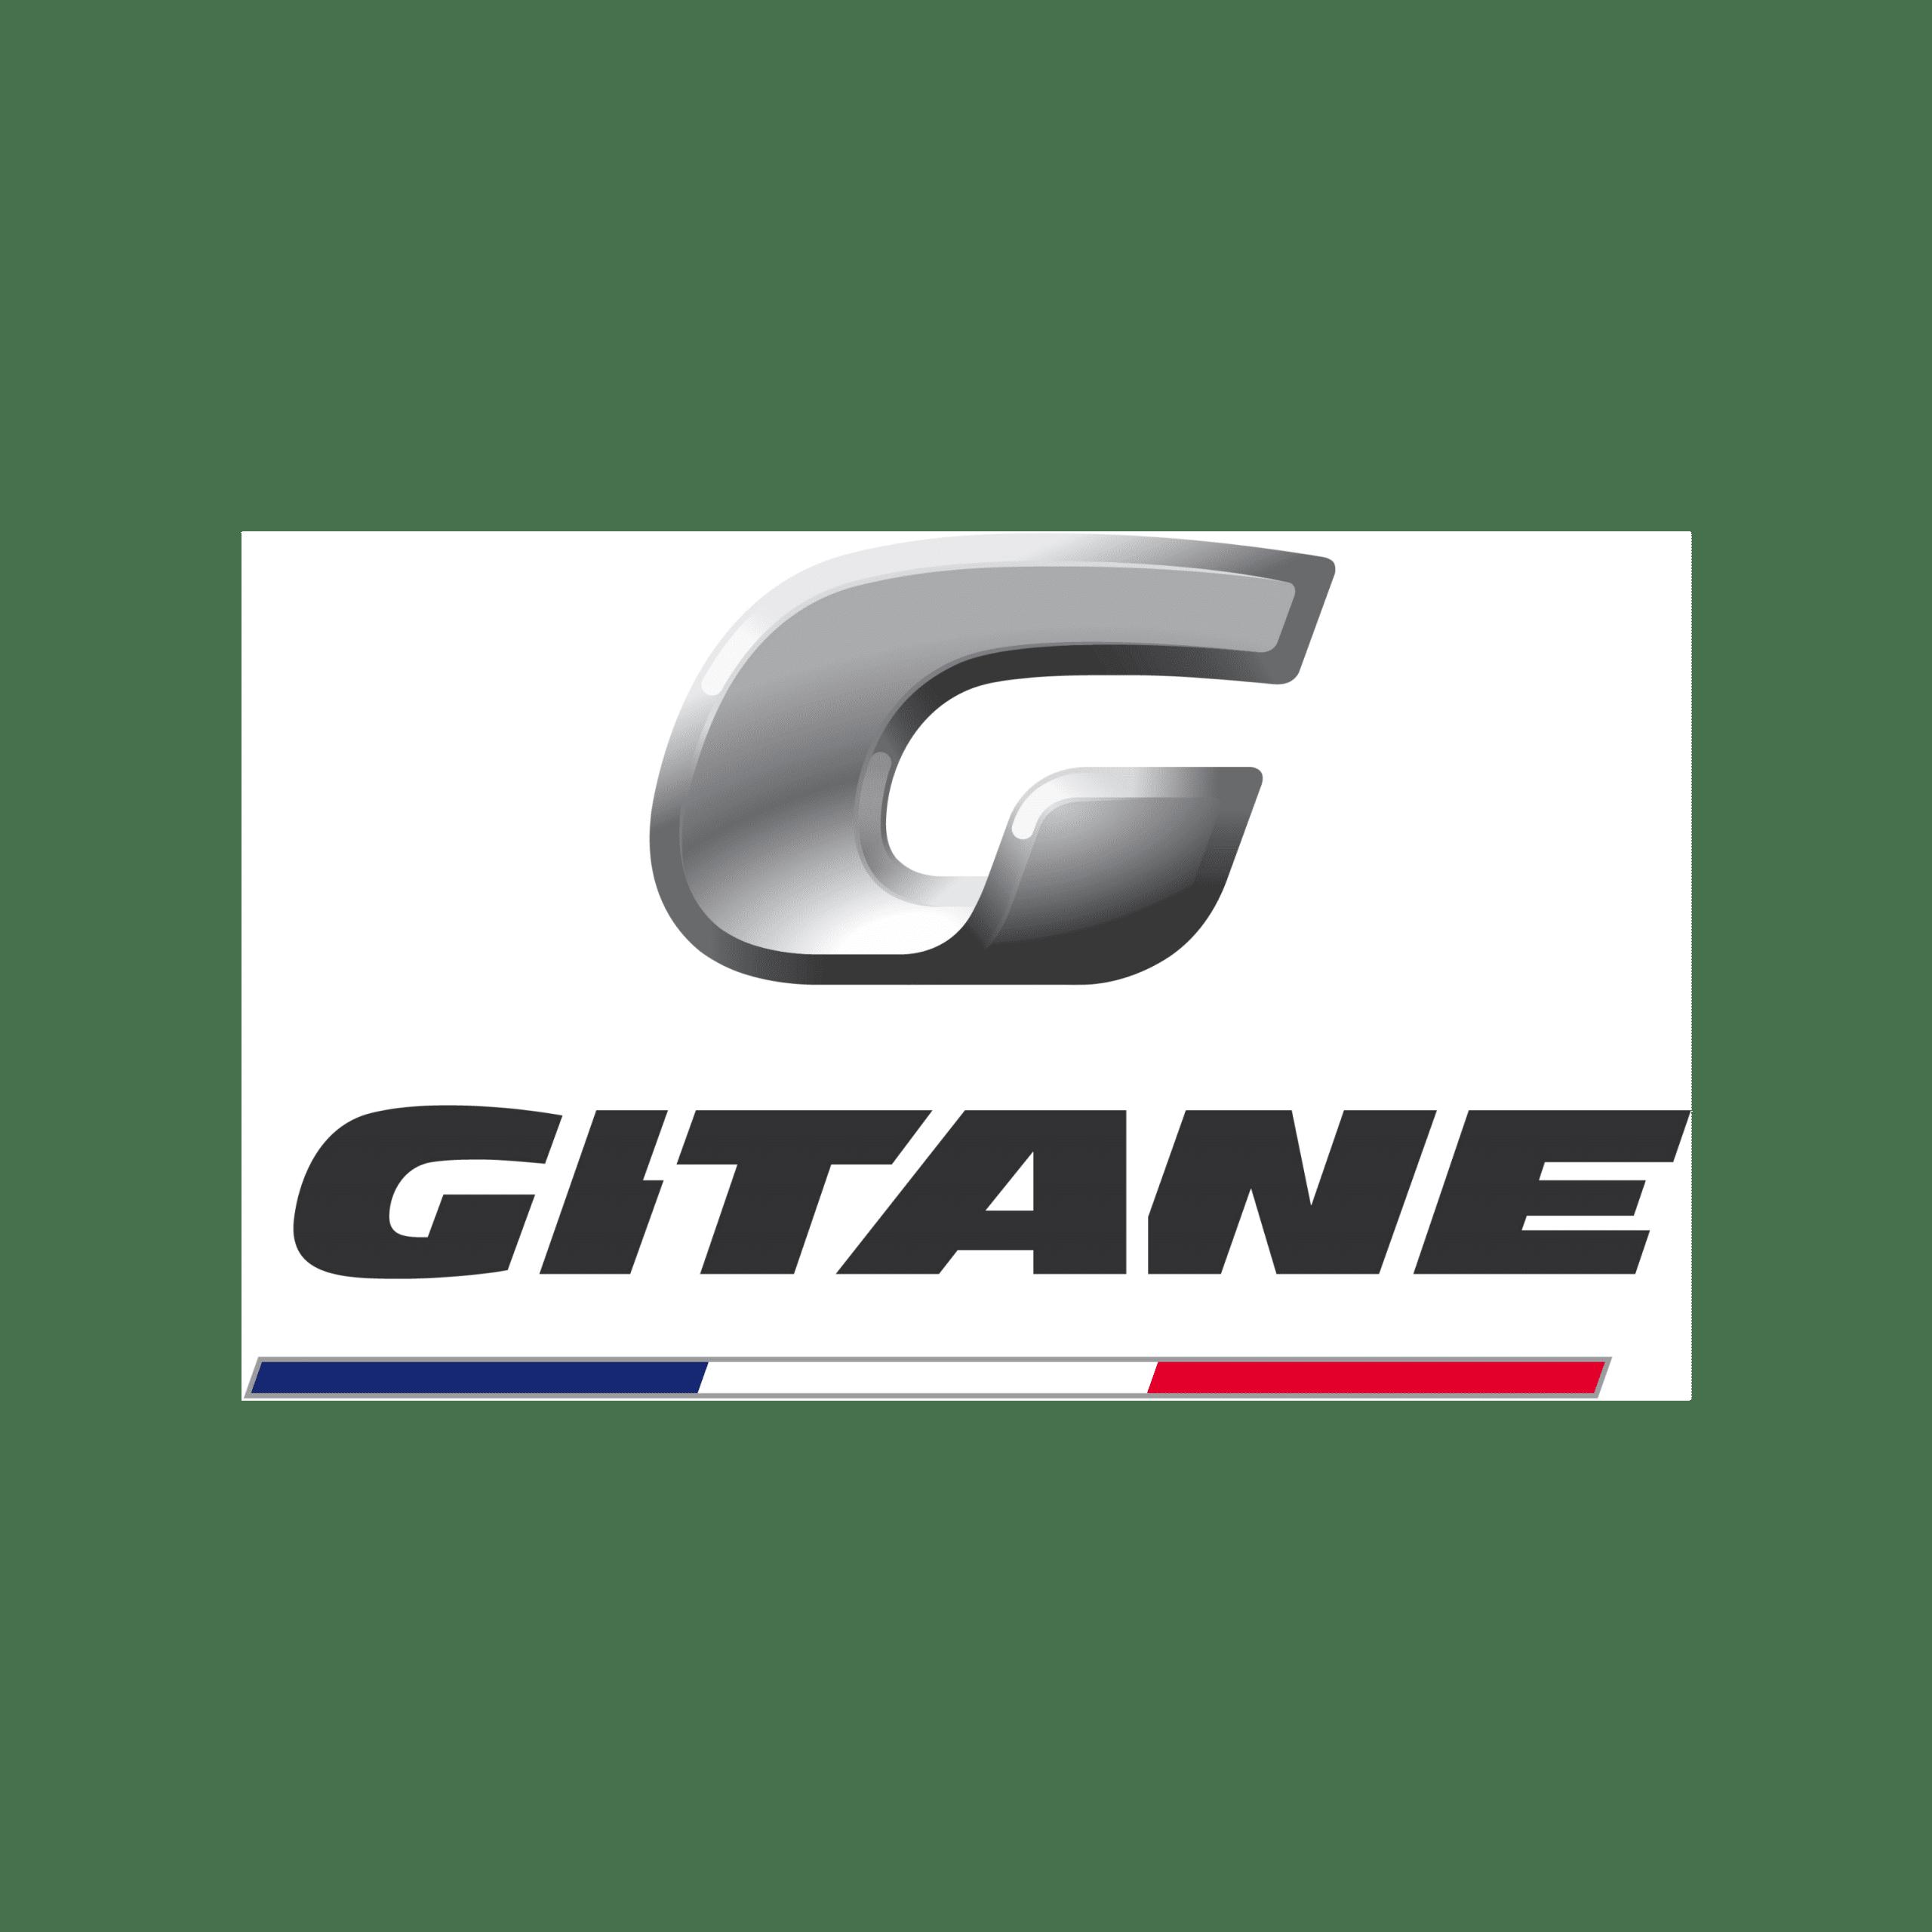 Gitane png